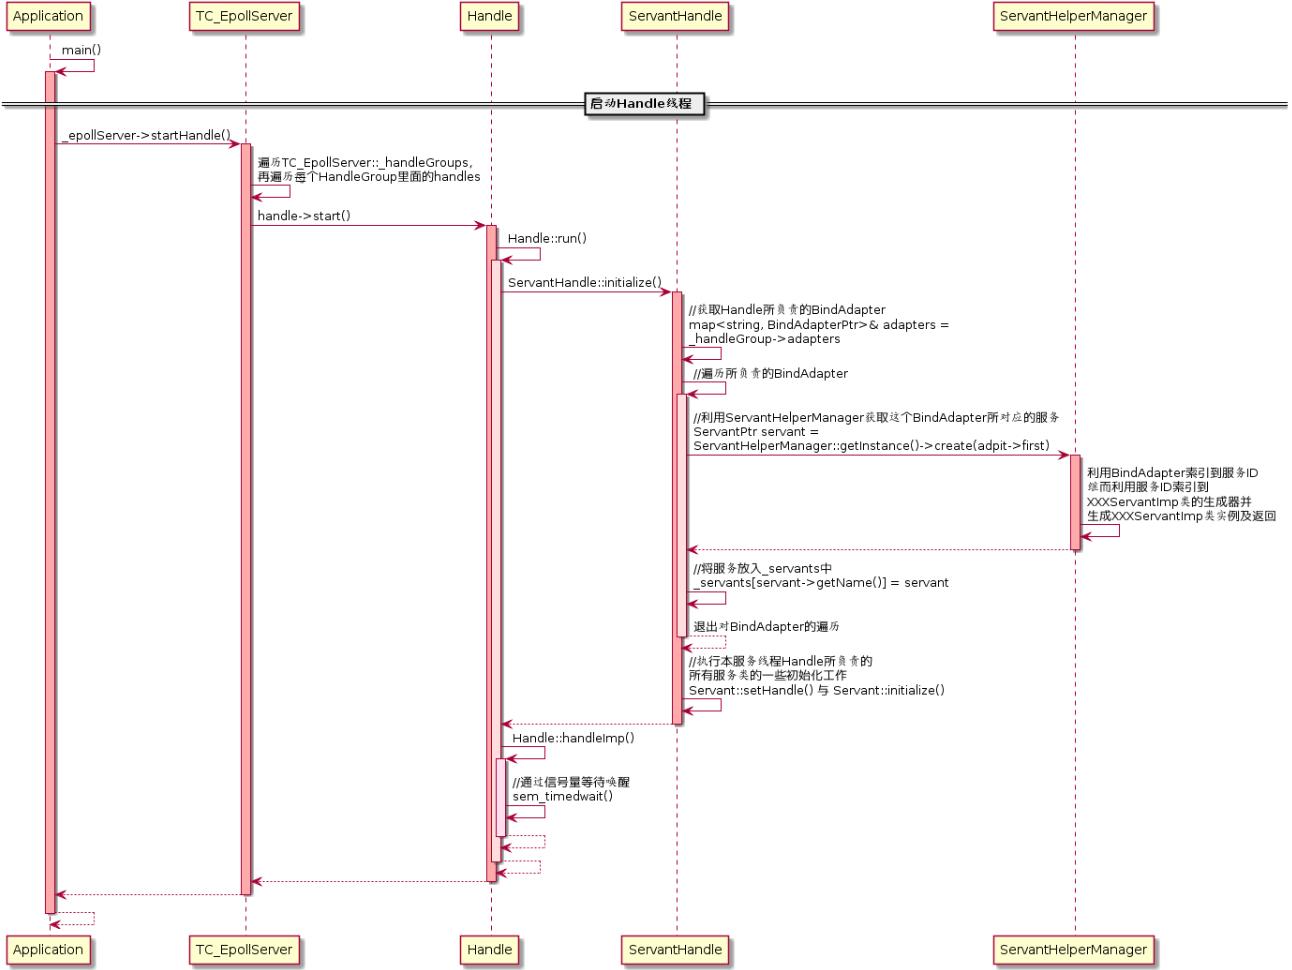 图(2-12)启动Handle业务线程